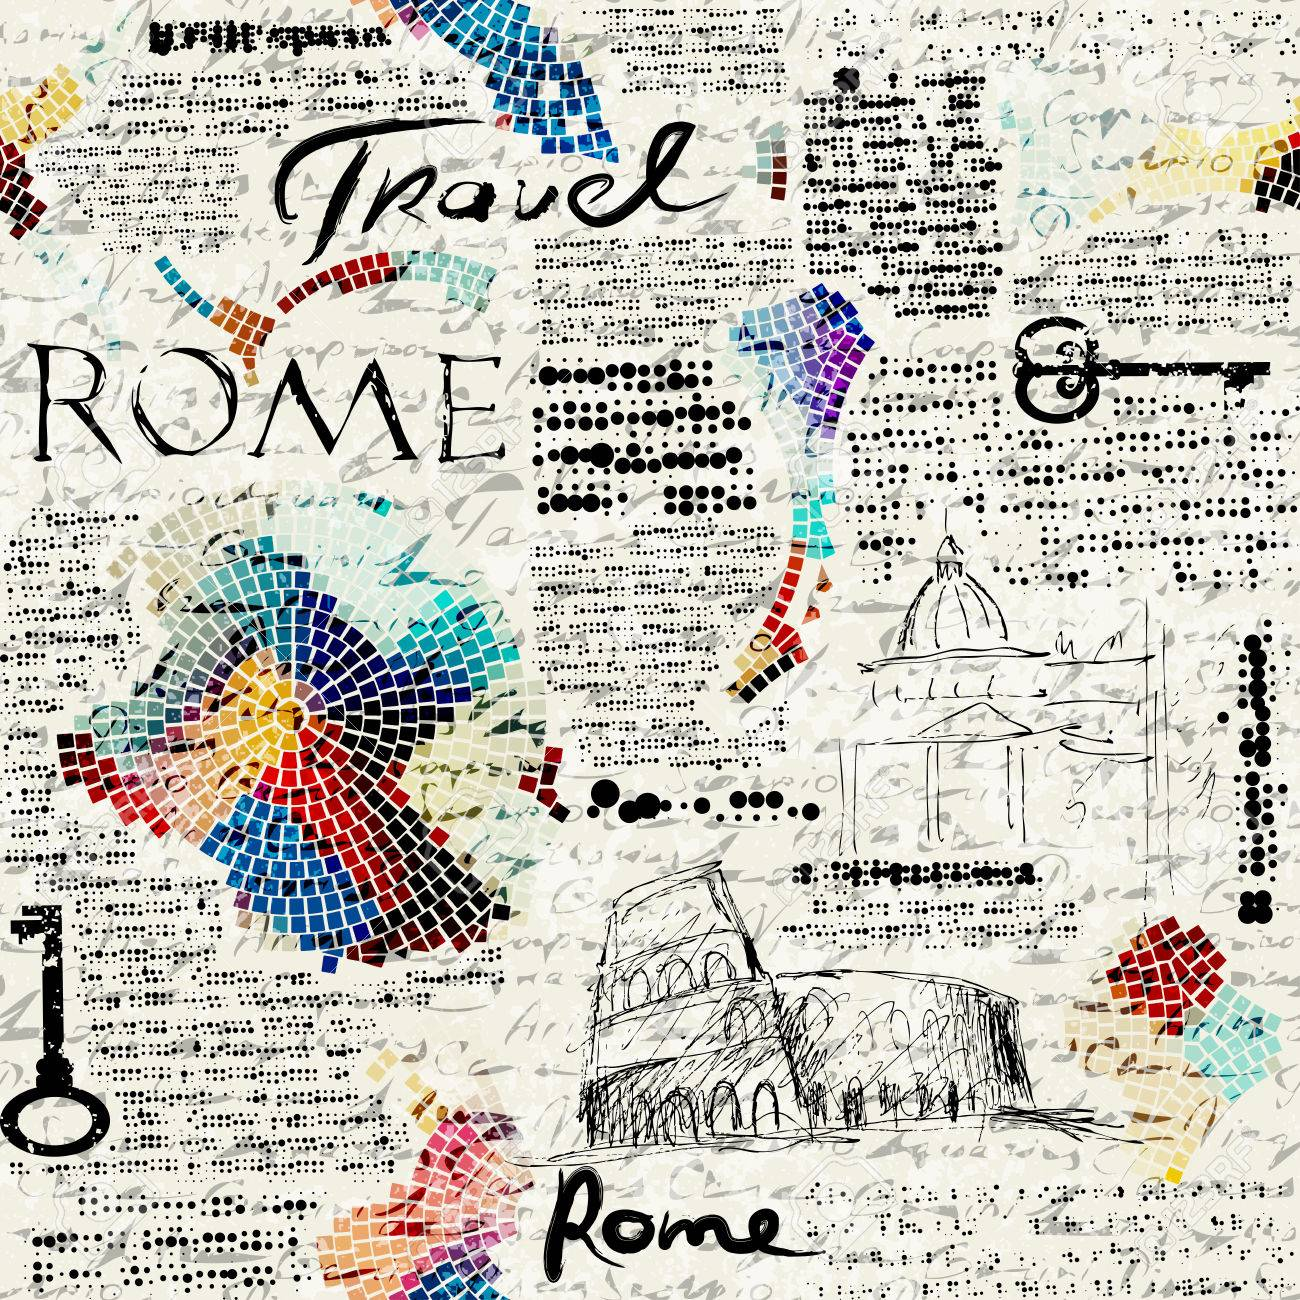 Imitation of retro newspaper background Rome travel - 47826881